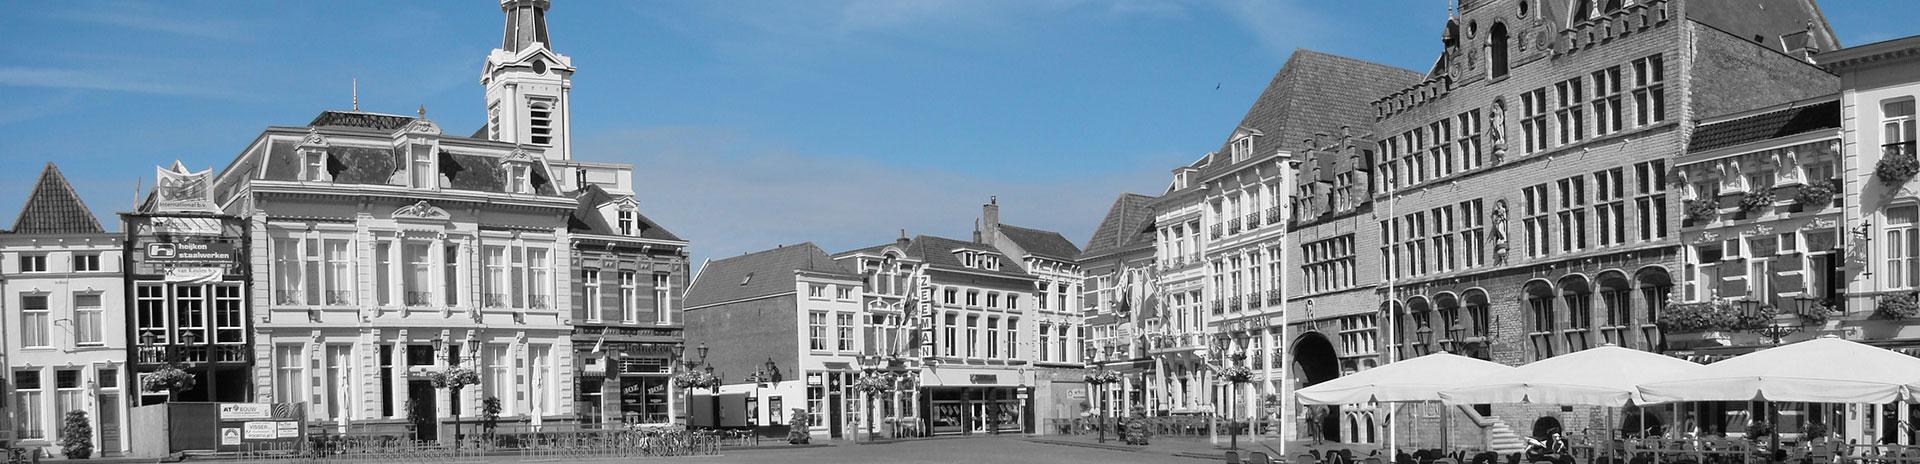 Letselschade advocaat Bergen op Zoom | LetselPro